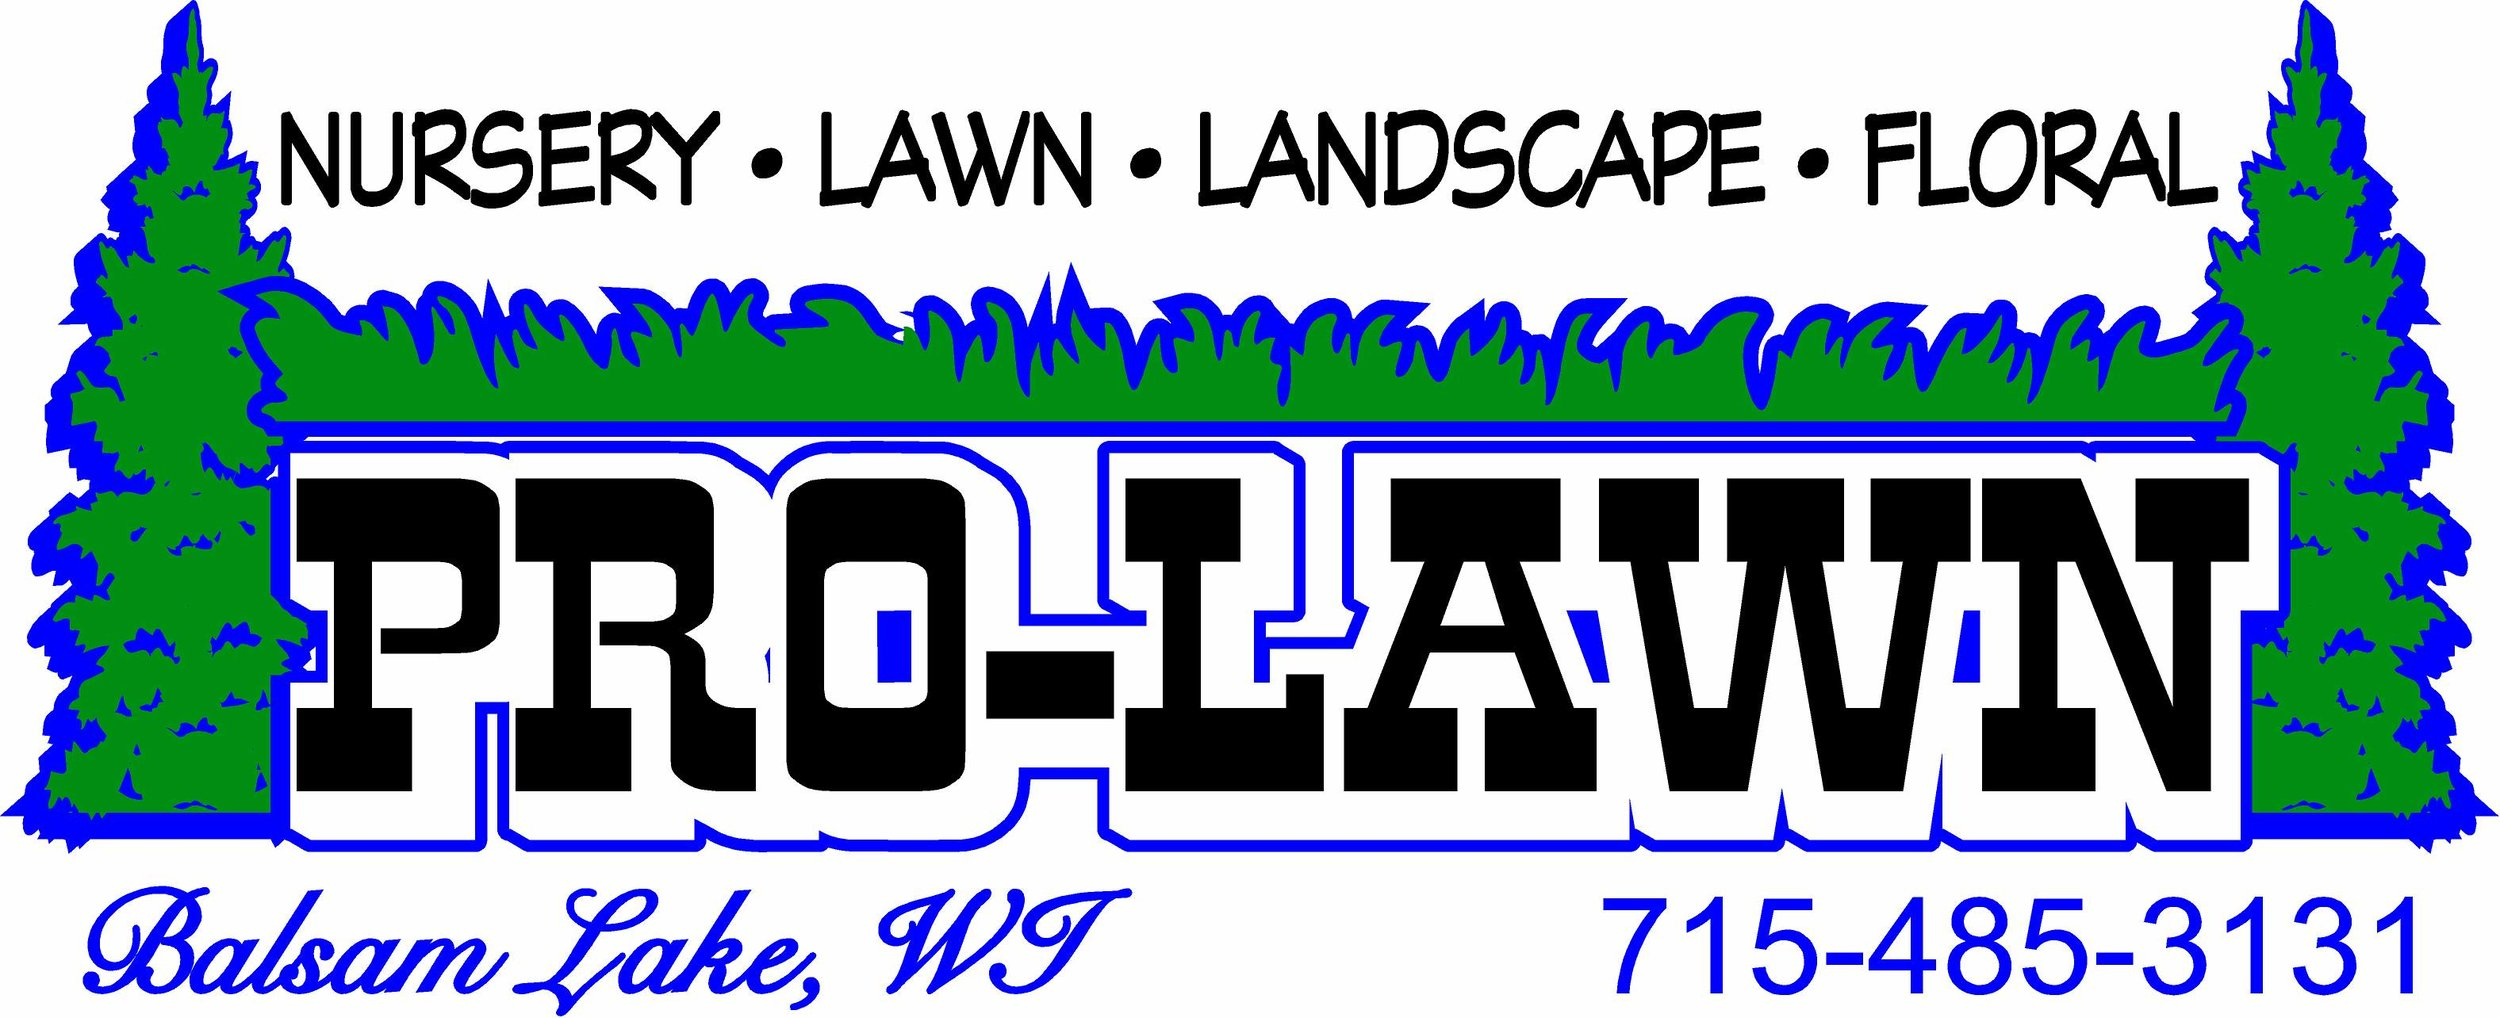 New Pro Lawn logo.jpg